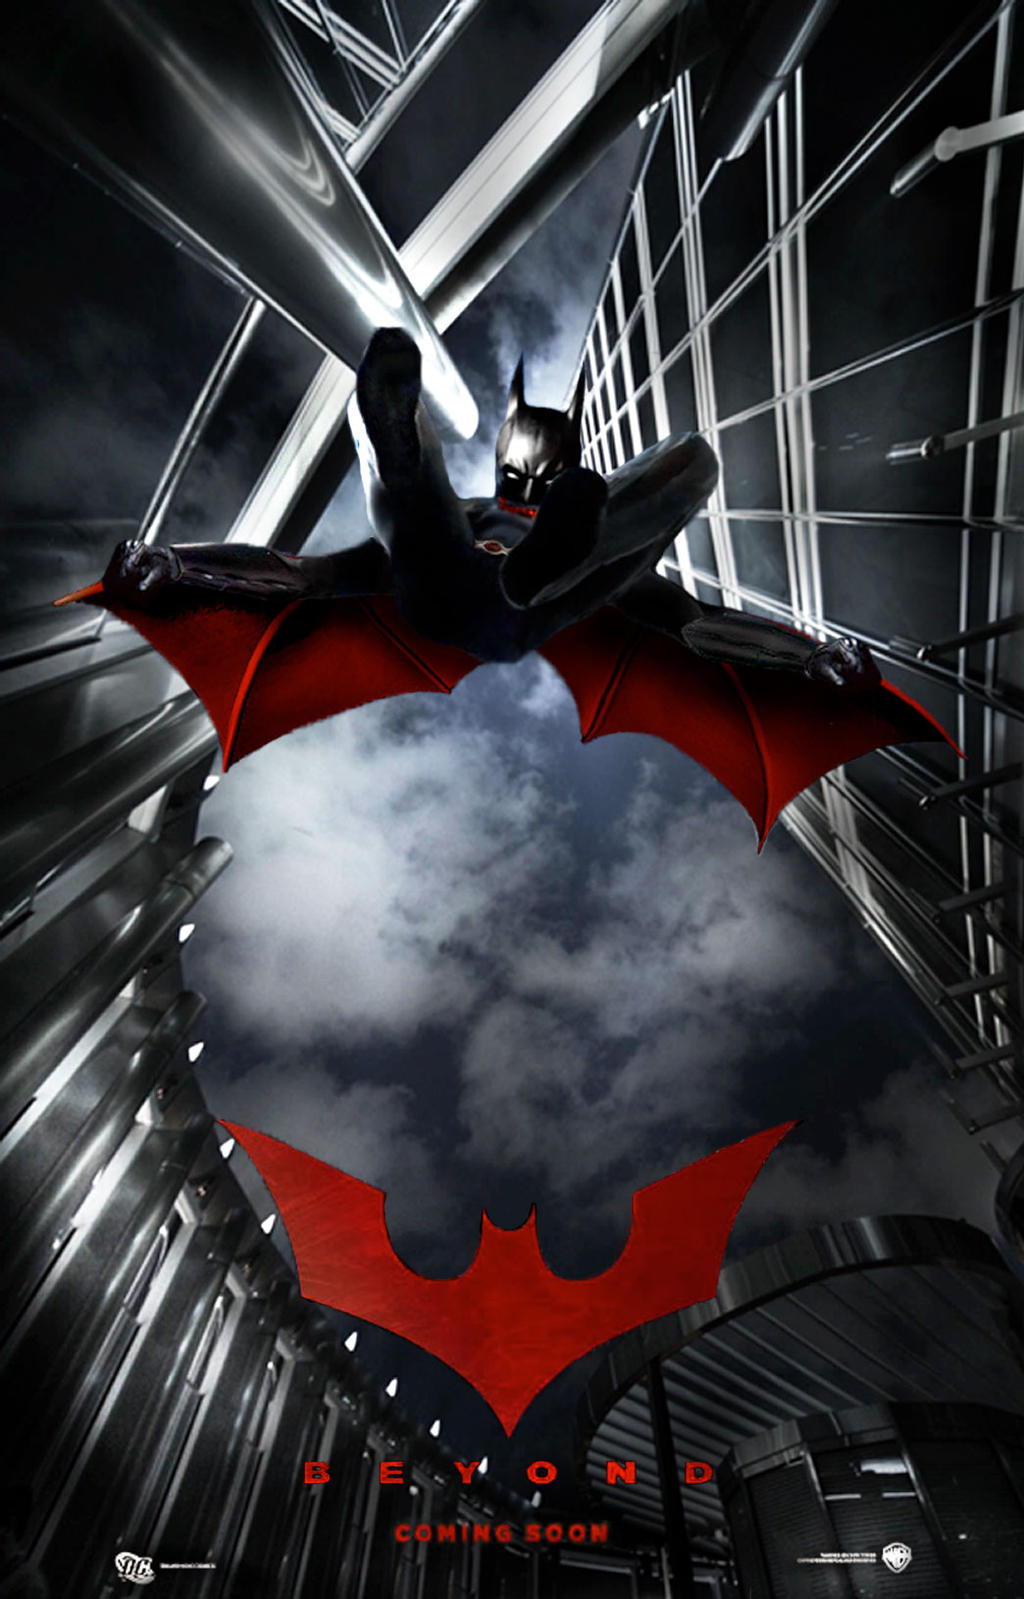 http://fc03.deviantart.net/fs70/i/2012/366/c/f/batman_beyond_live_action_poster__better_version__by_minirifpomsiyu-d5pwqnm.jpg